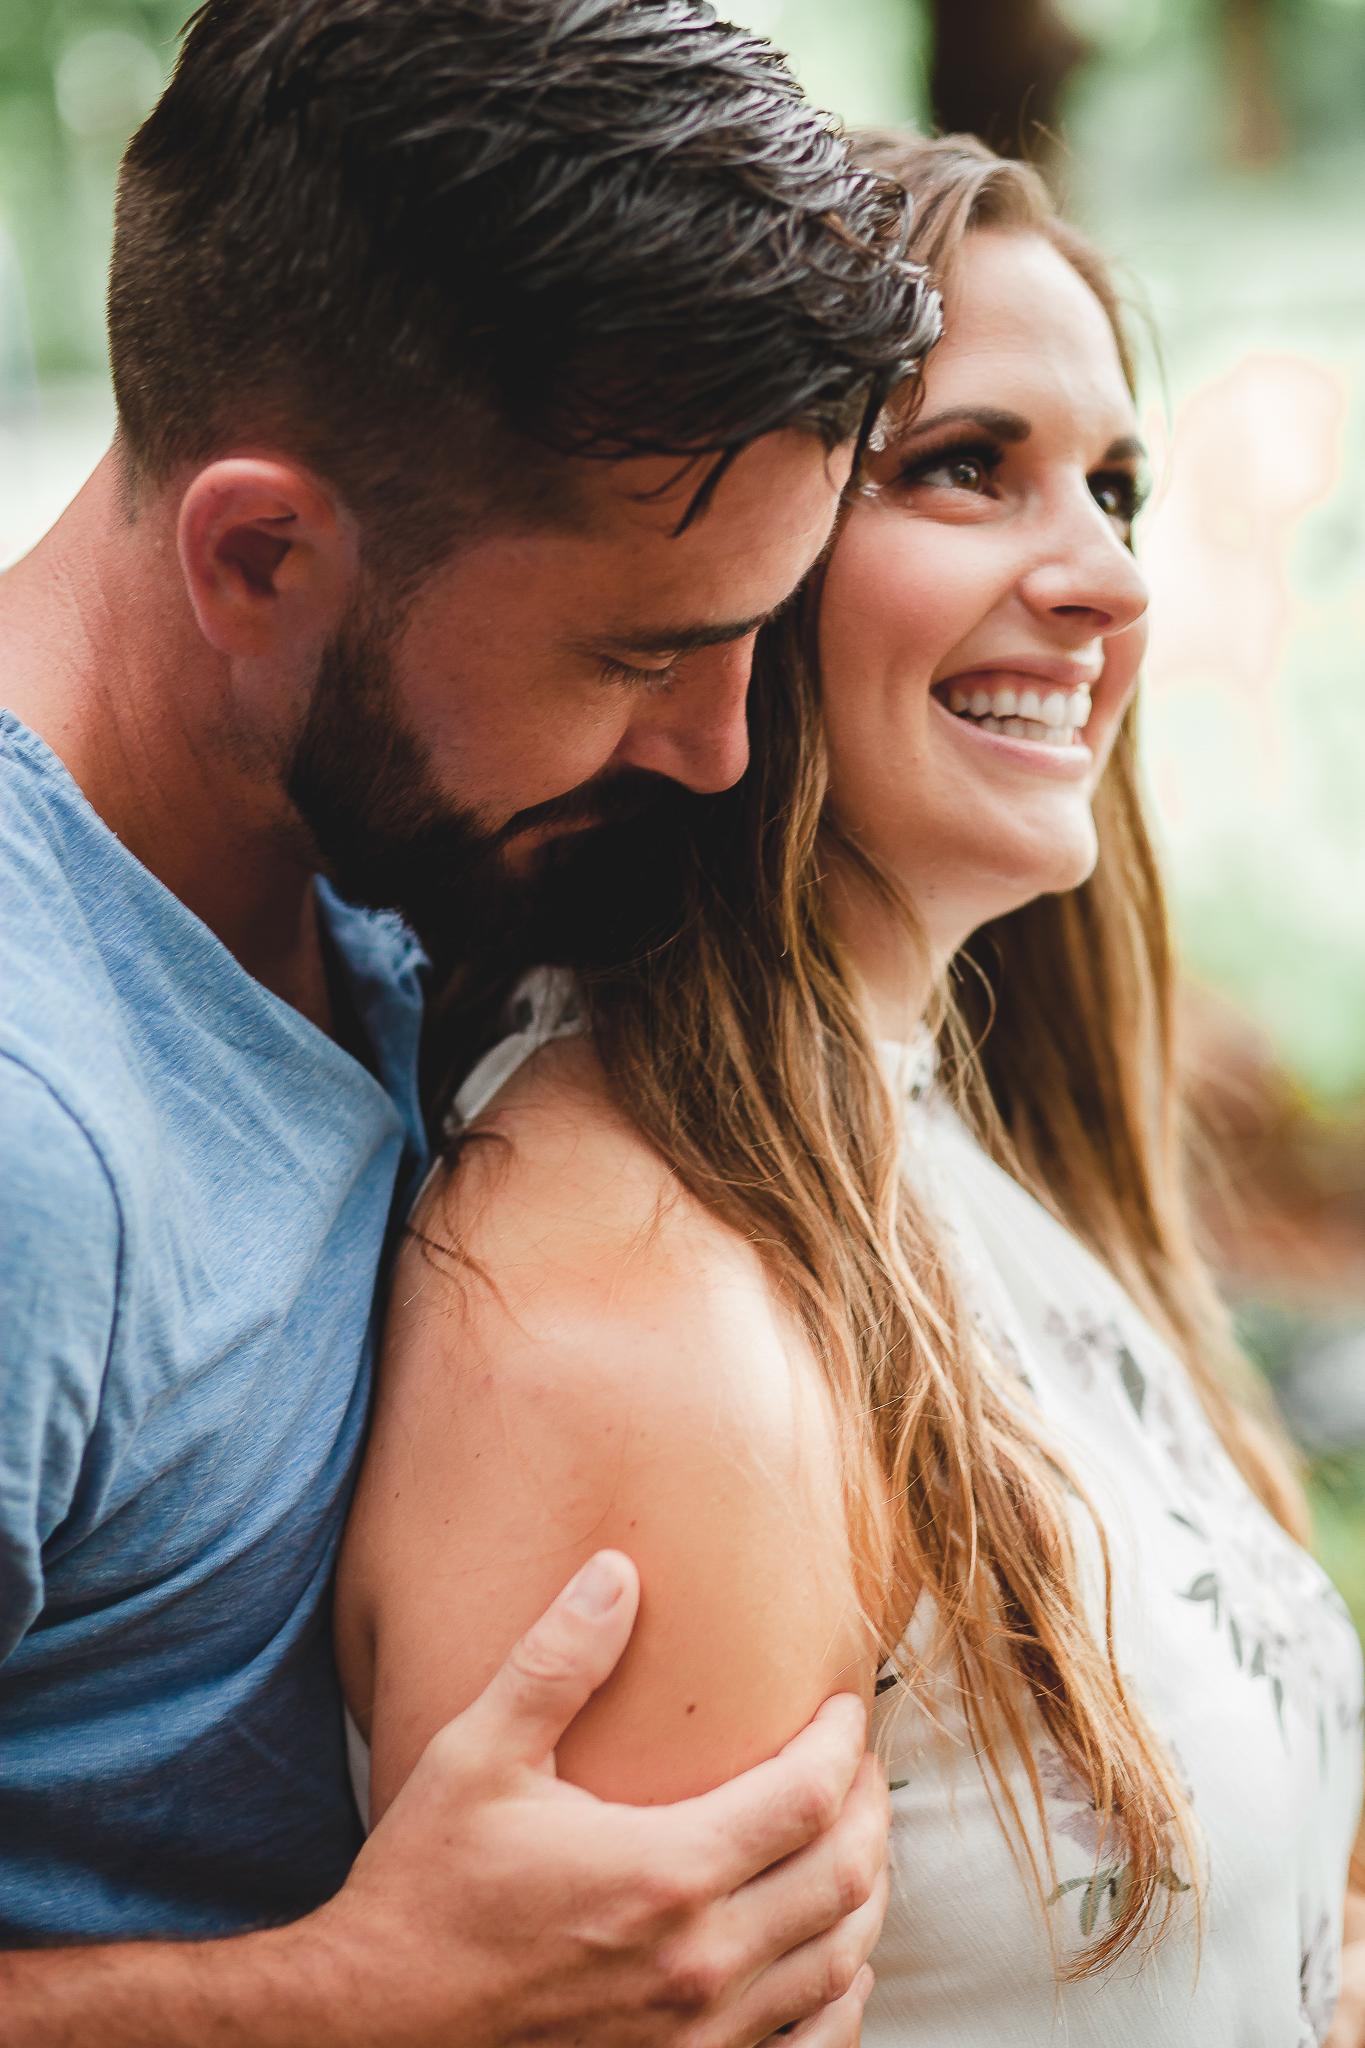 Amy D Photography- Barrie Wedding Photography- Barrie Wedding Photography- Engagement Session- Engagement Photography- Engagement Session Ideas- Wedding Photography-21.jpg